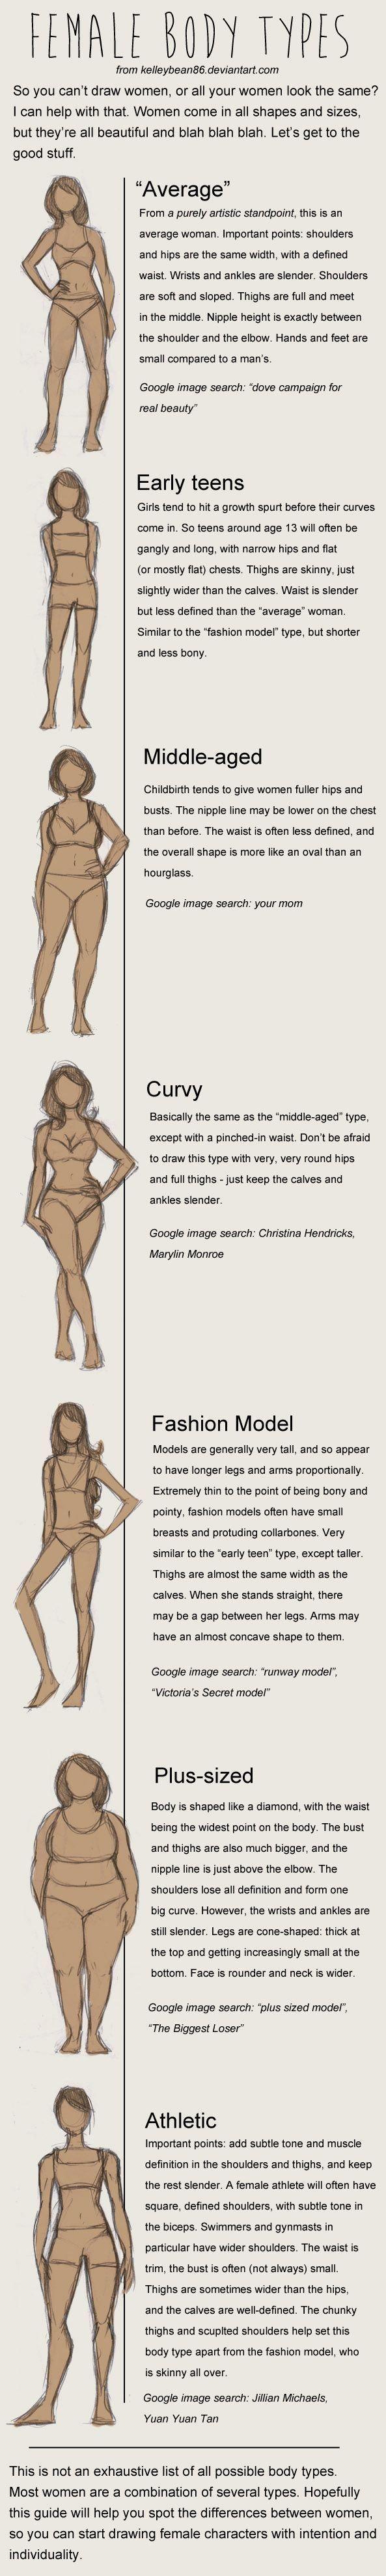 Aprenda a Desenhar #3: Corpo Humano+Perspectiva+Animais | Anatomie ...